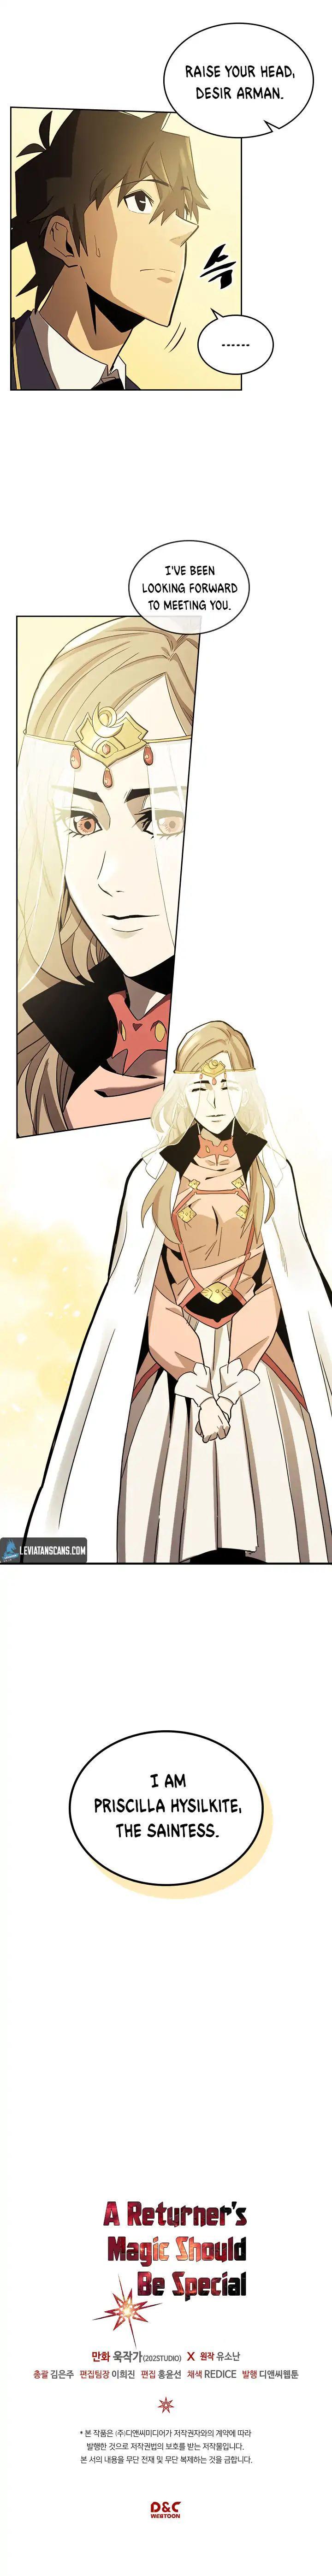 A Returner's Magic Should Be Special Chapter 76 page 9 - Mangakakalots.com